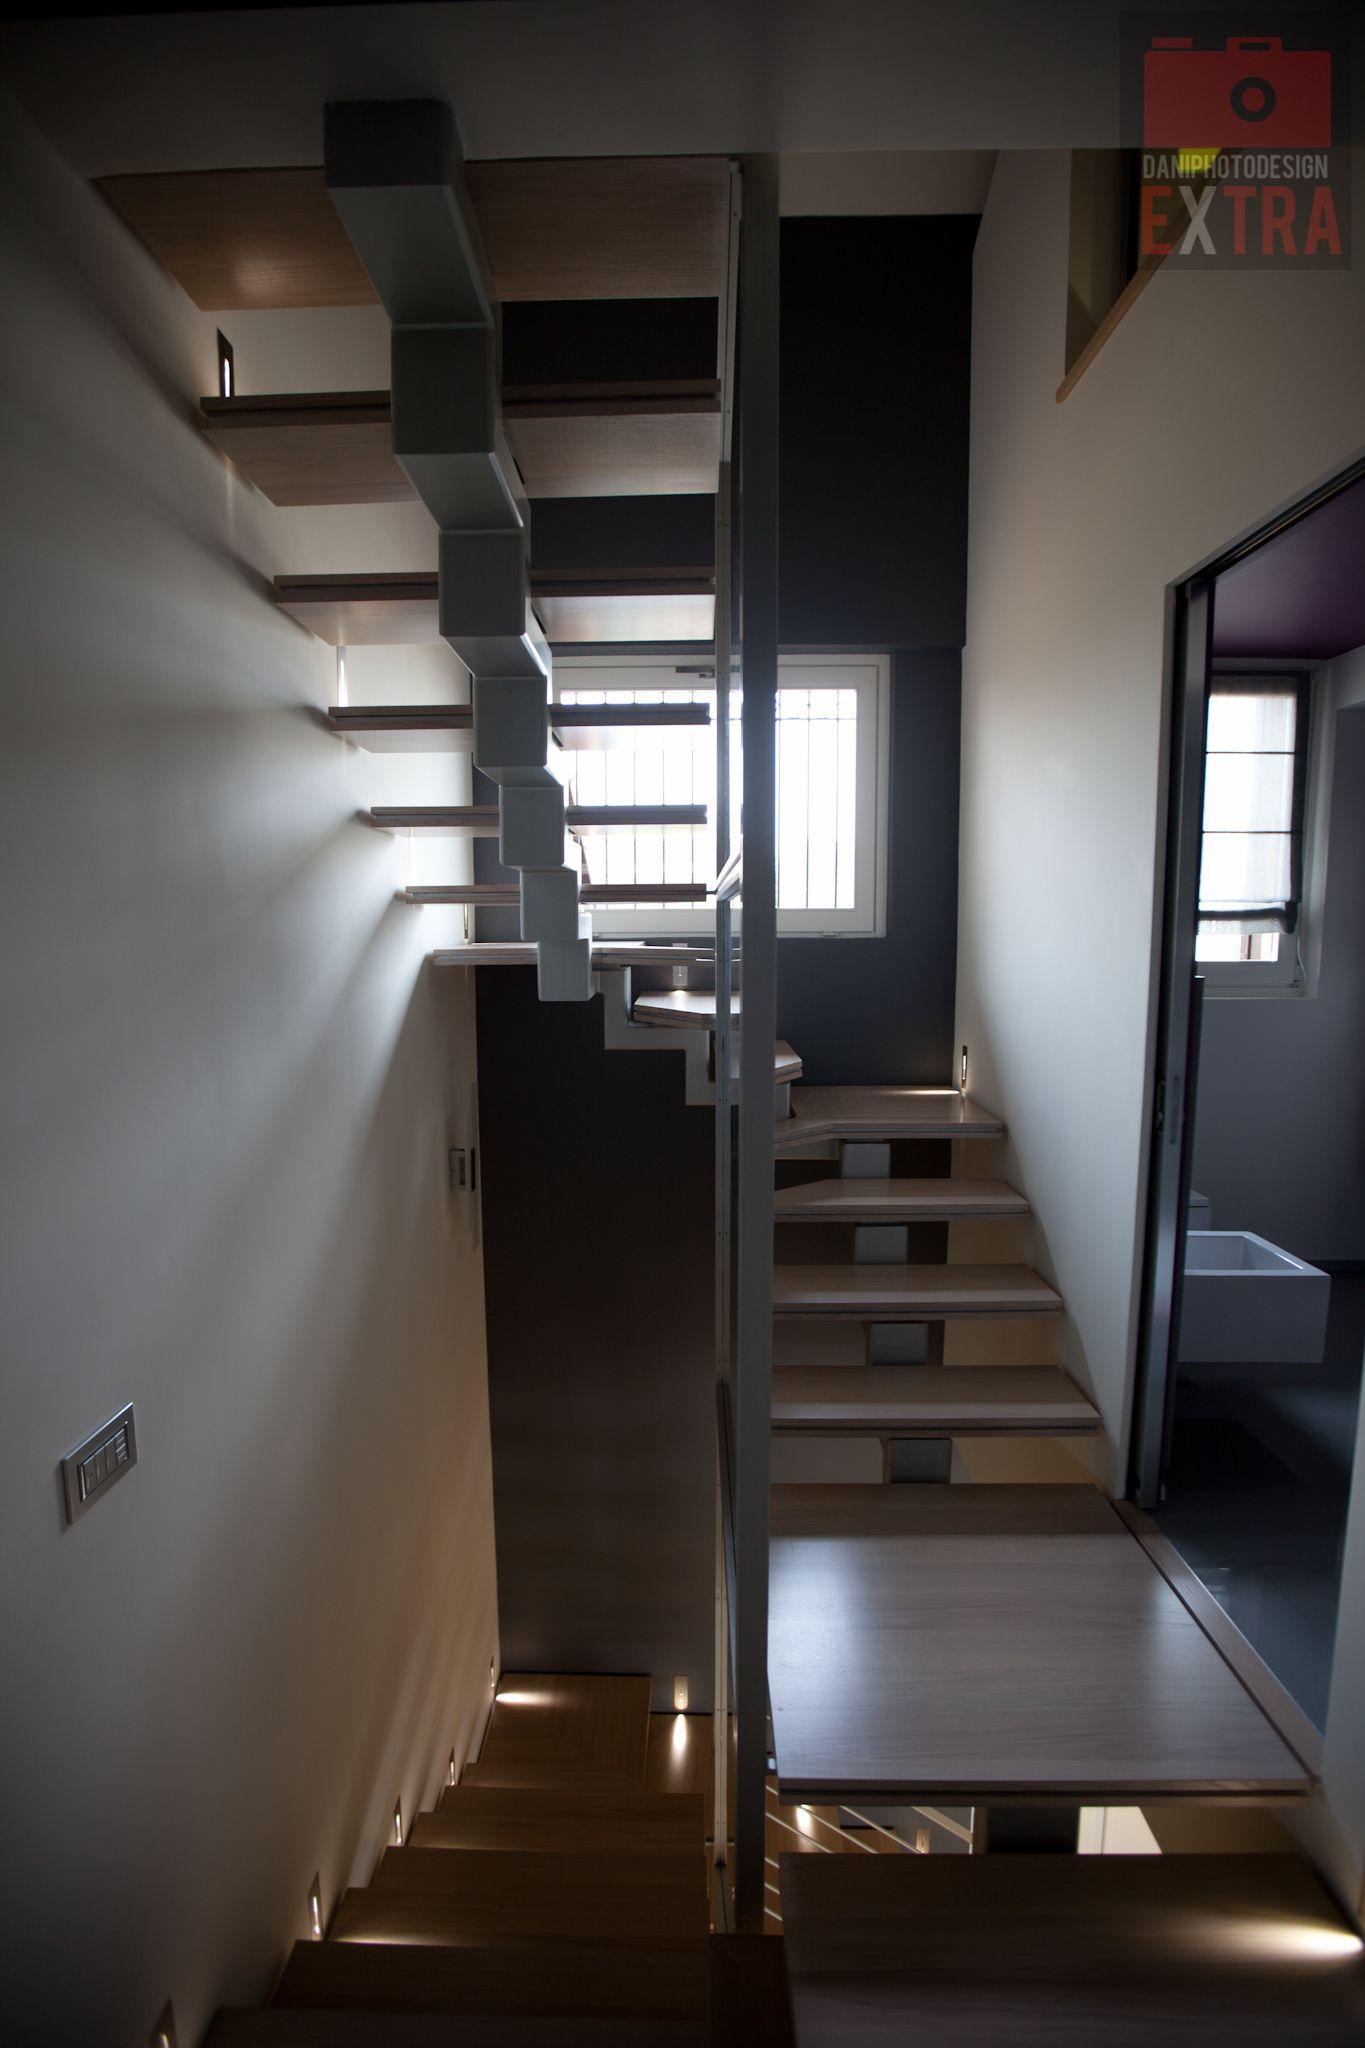 Interior - daniphotodesign.com